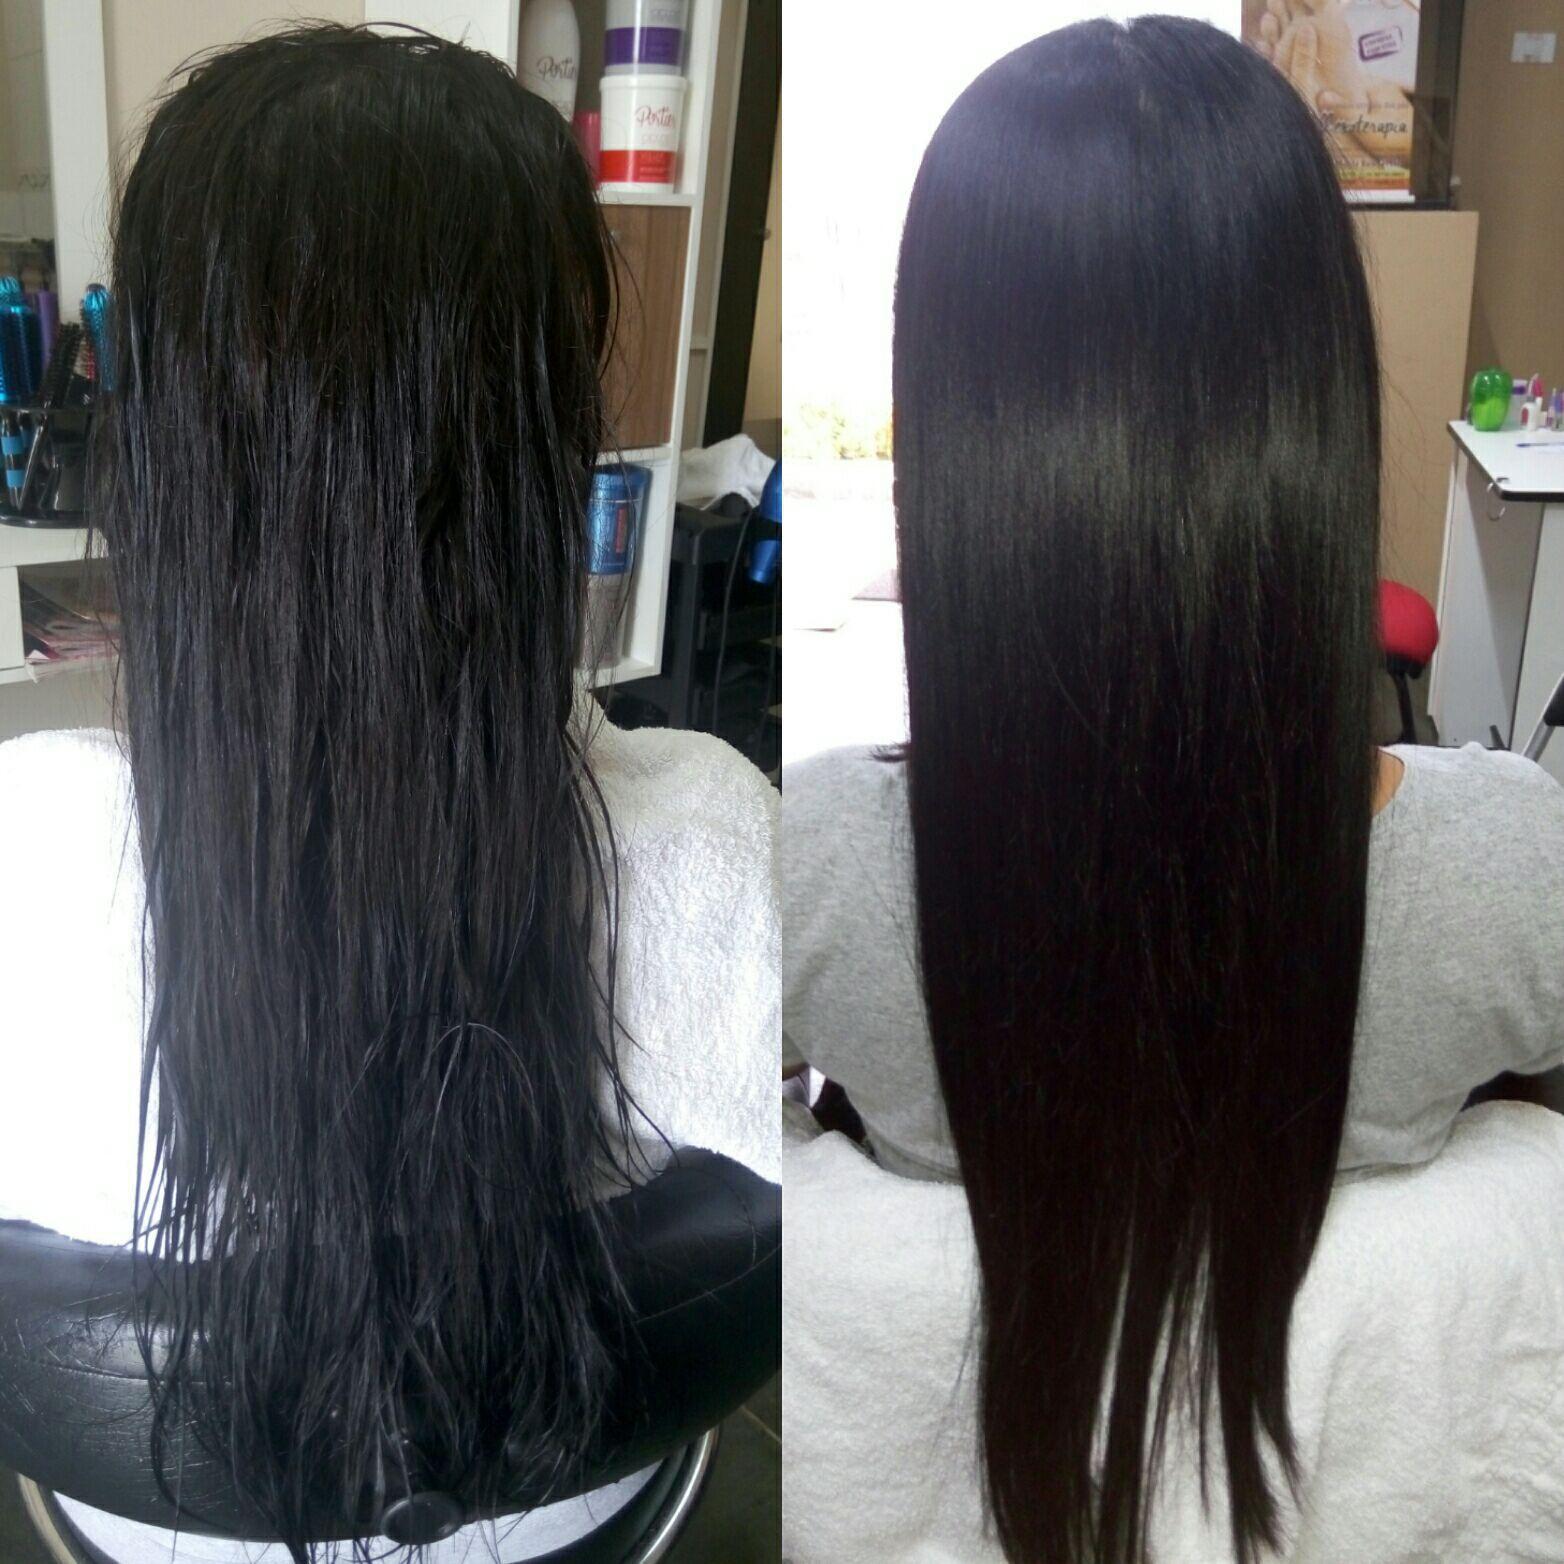 Progressiva ZAP cabelo auxiliar cabeleireiro(a) cabeleireiro(a) auxiliar cabeleireiro(a)